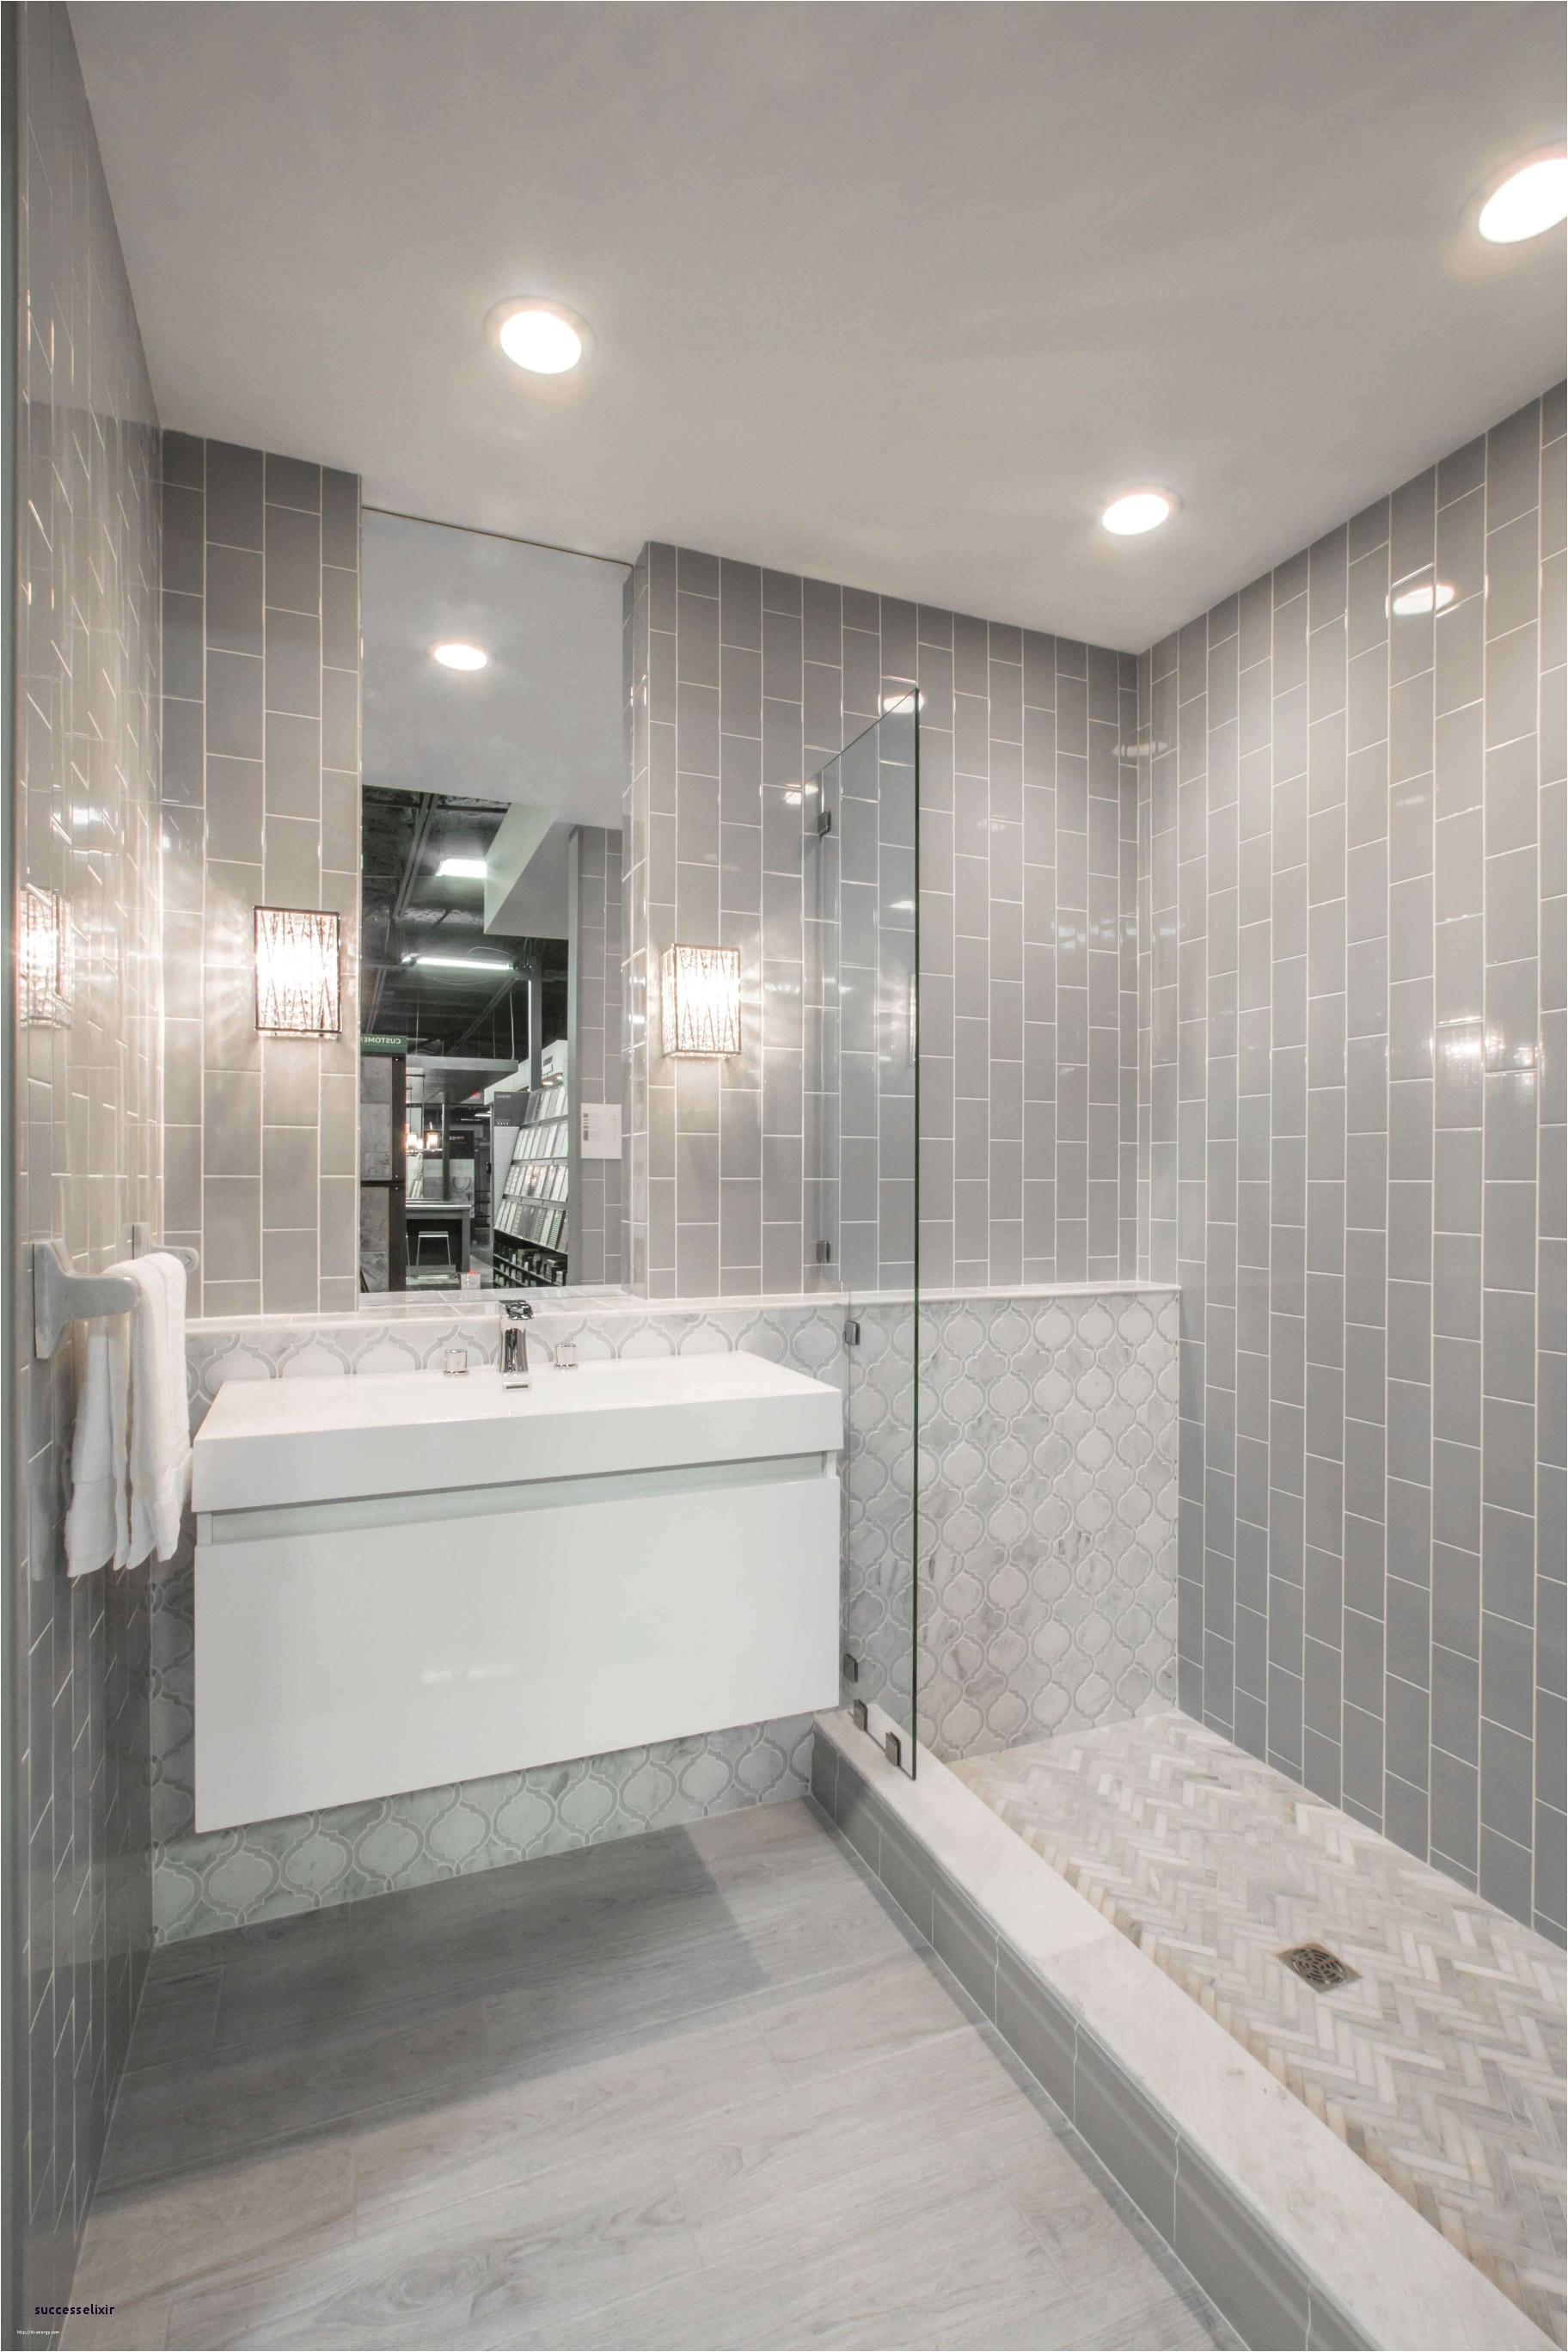 Tiles for Small Bathroom Design Ideas Marvelous Small Bathroom Shower Tile Ideas